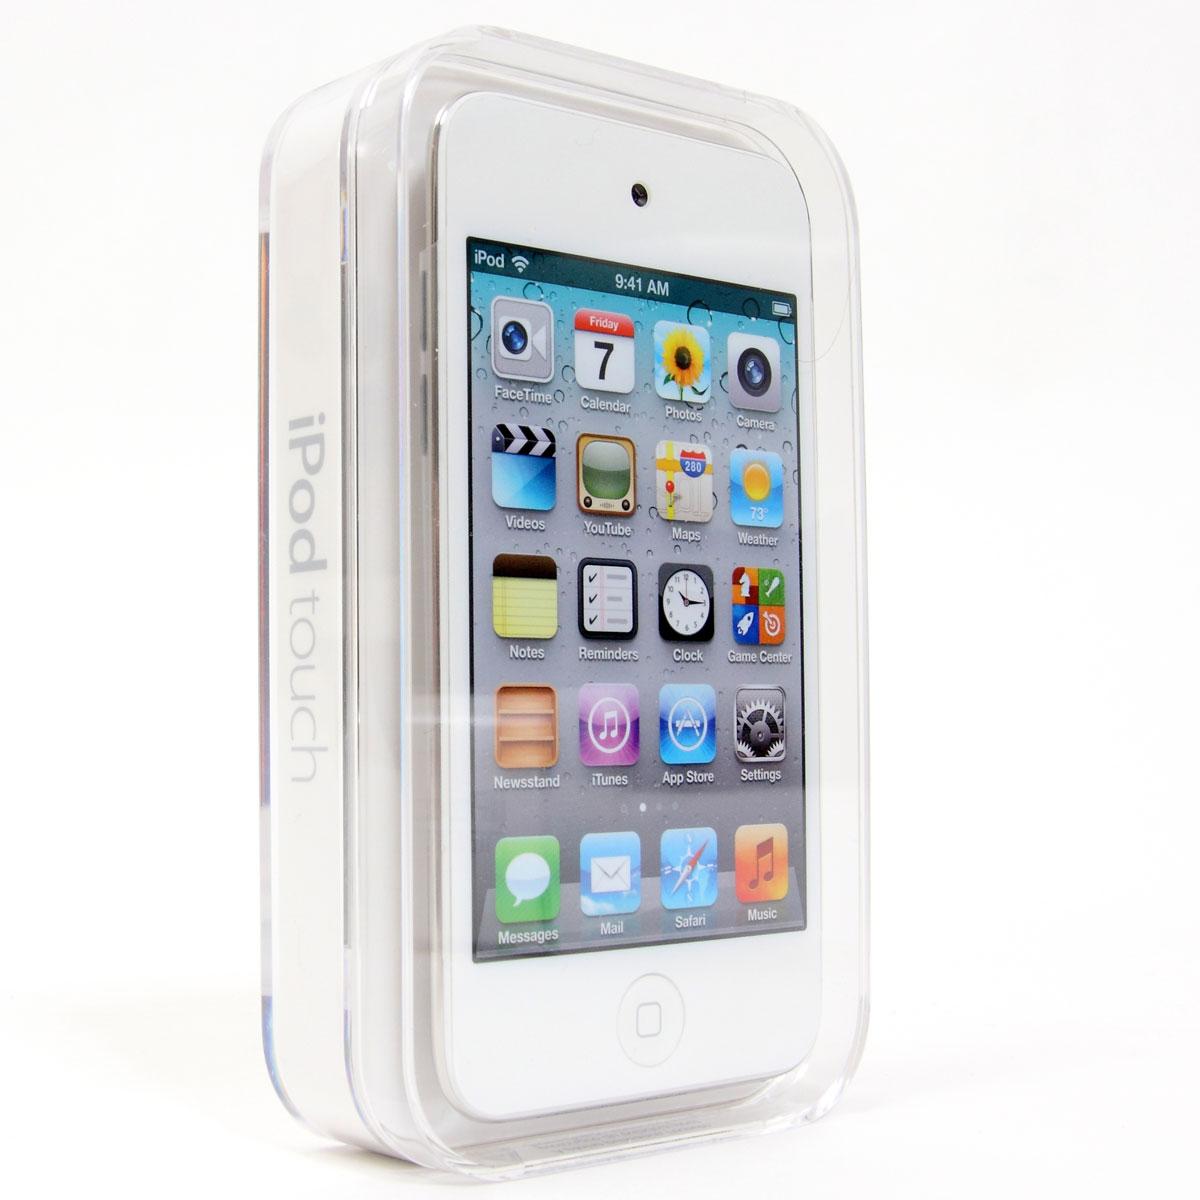 Lecteur MP3 & iPod Apple iPod Touch Blanc 8 Go Apple iPod Touch Blanc 8 Go